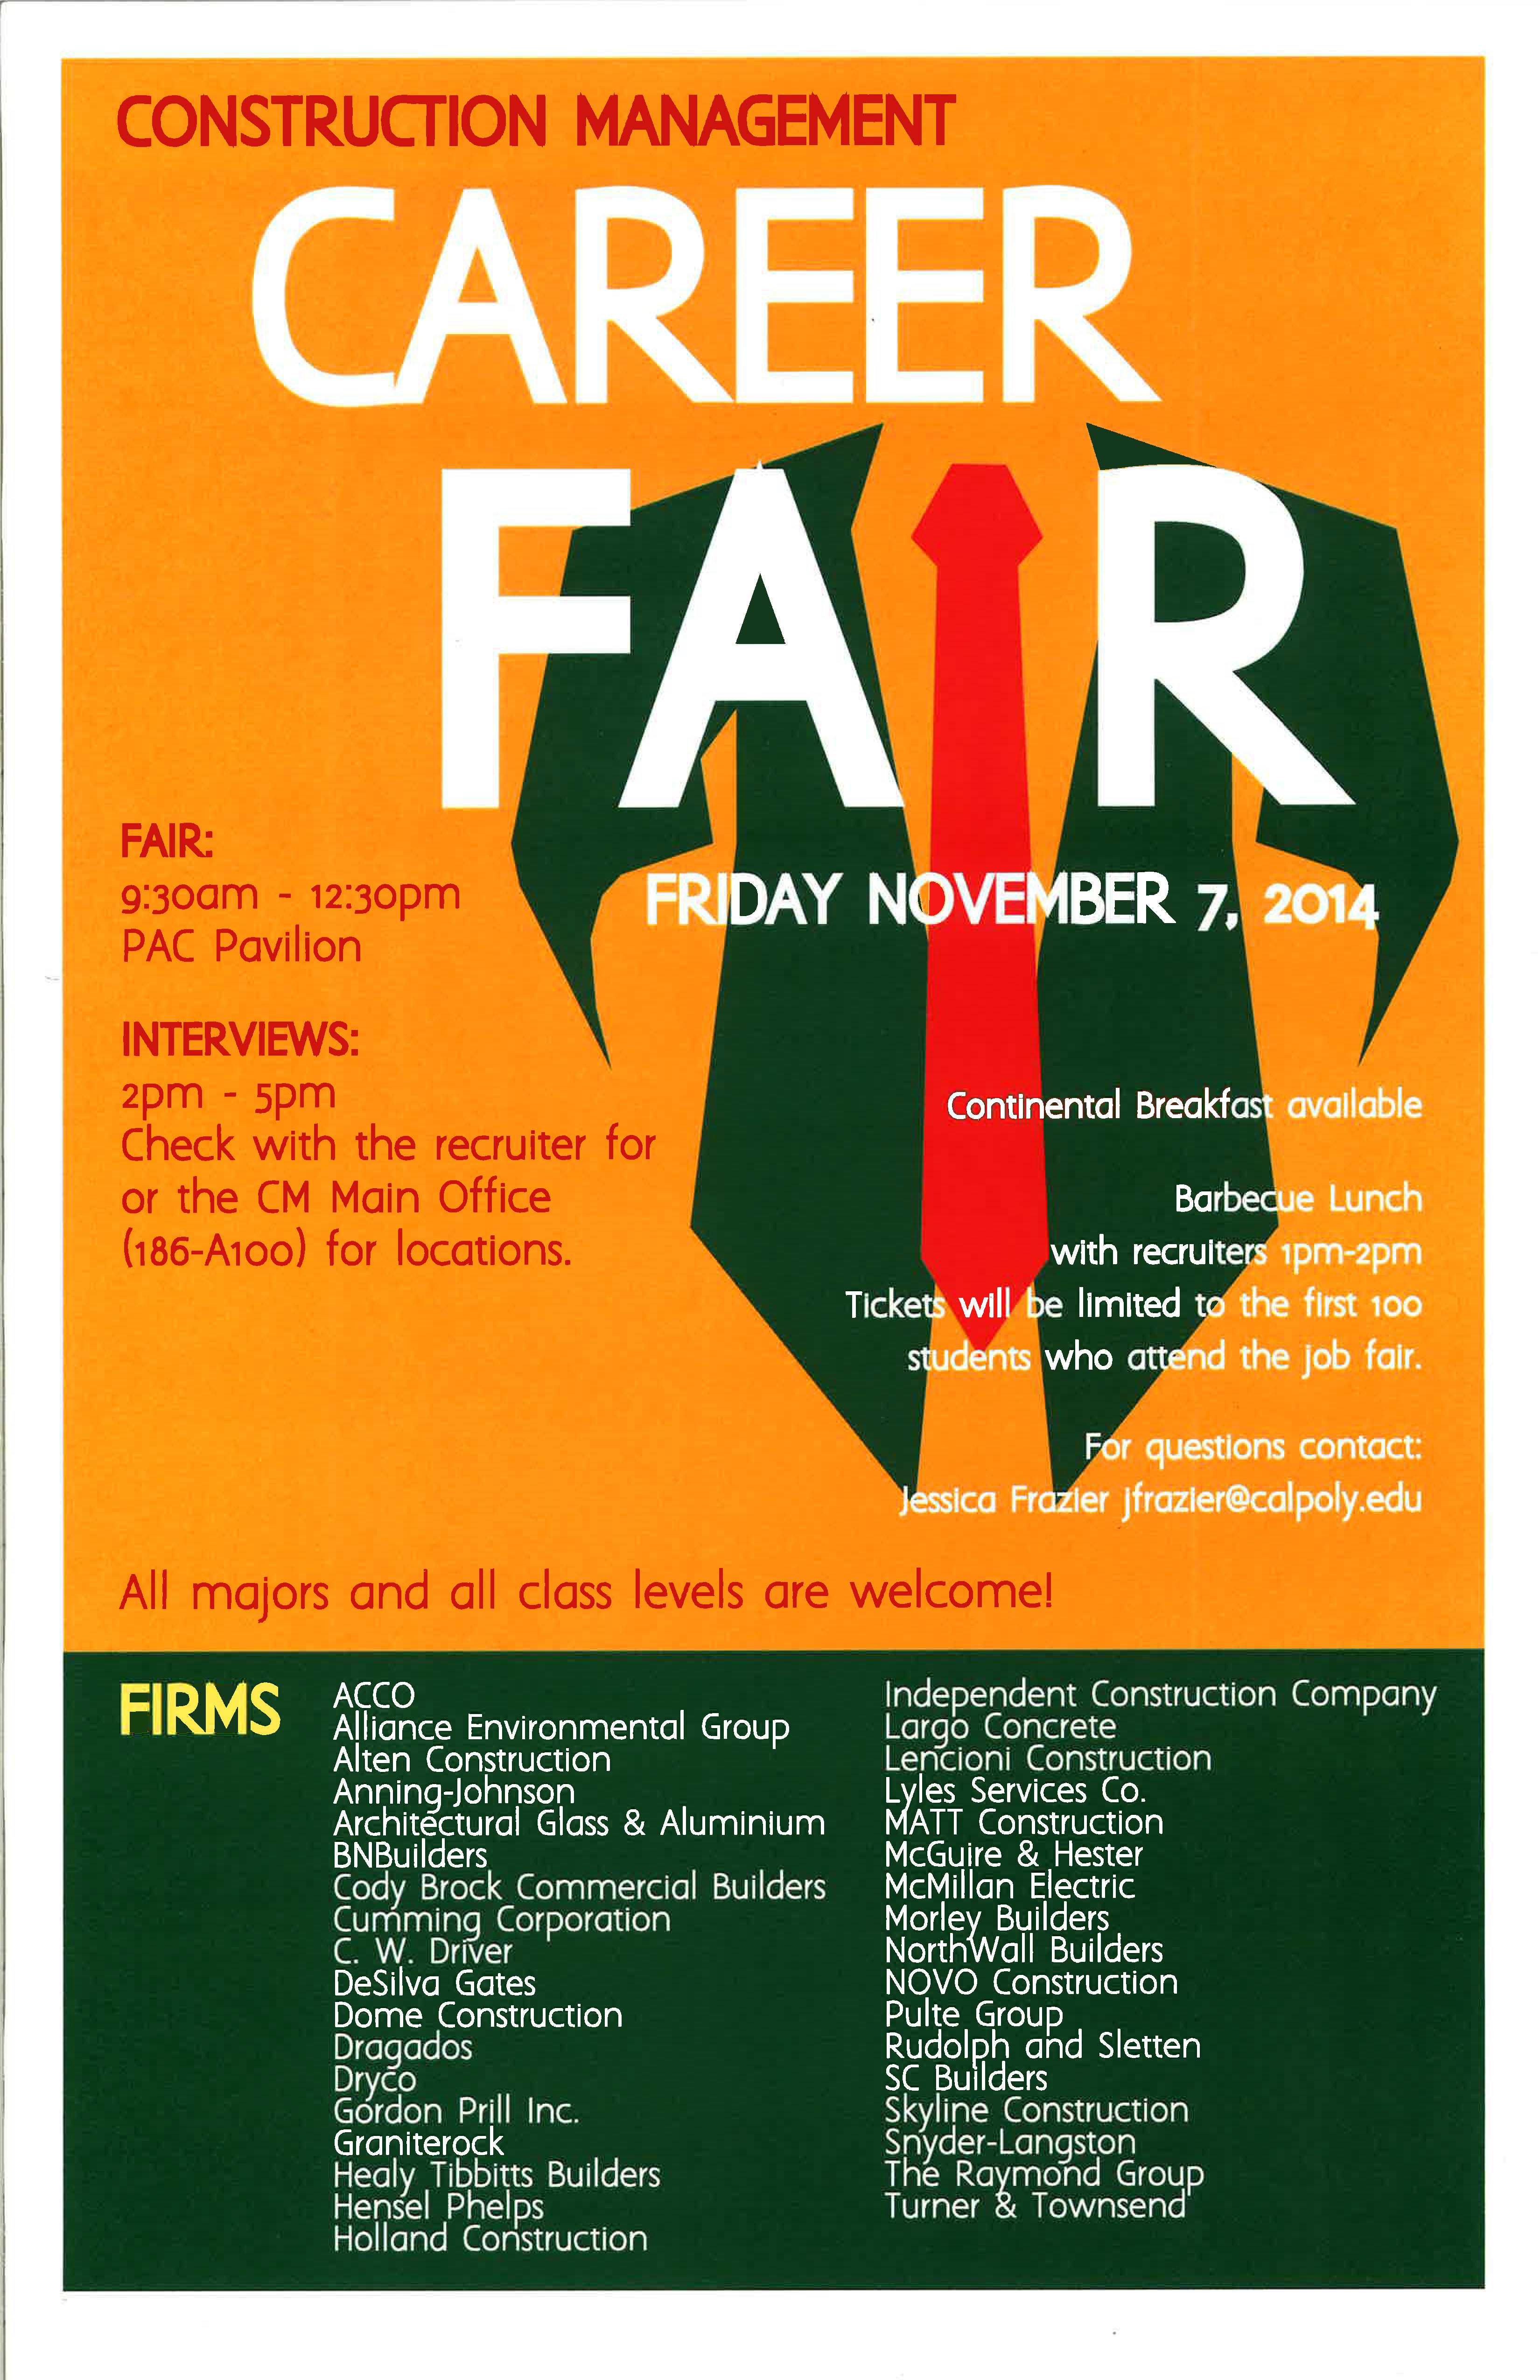 Banner design for job fair - Construction Management Career Fair